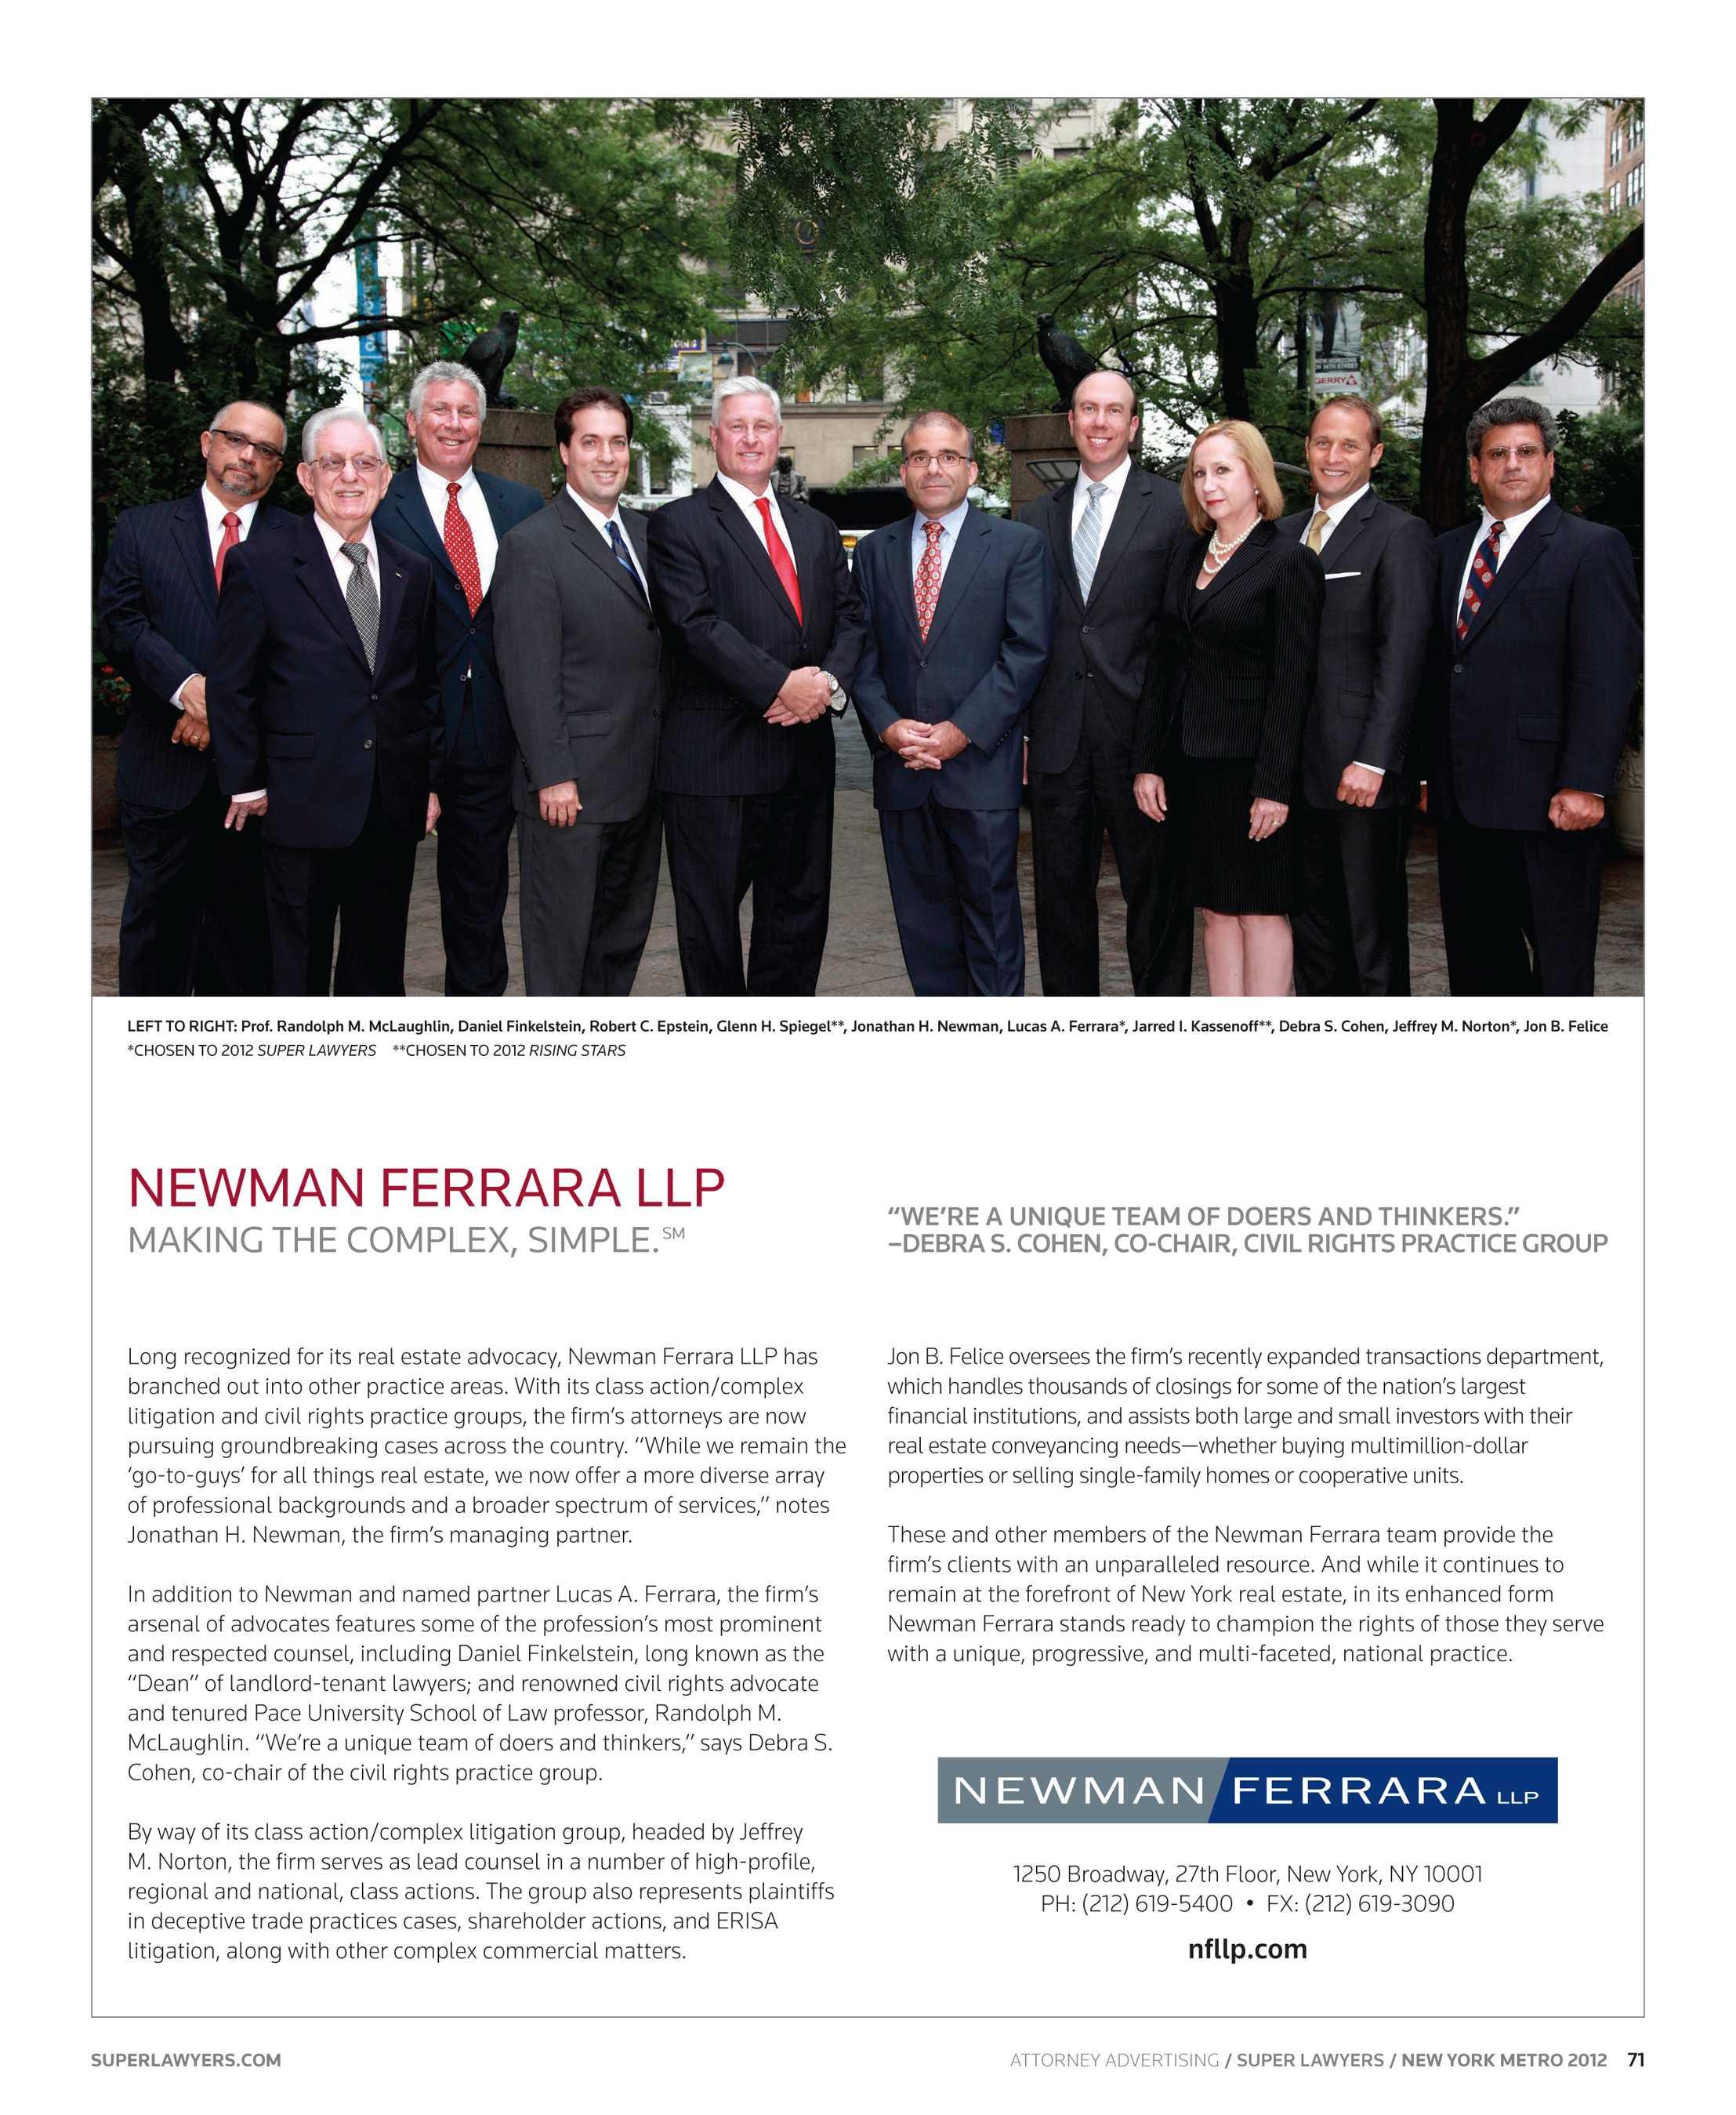 b22abe2e662 Super Lawyers - New York - Metro 2012 - page 71